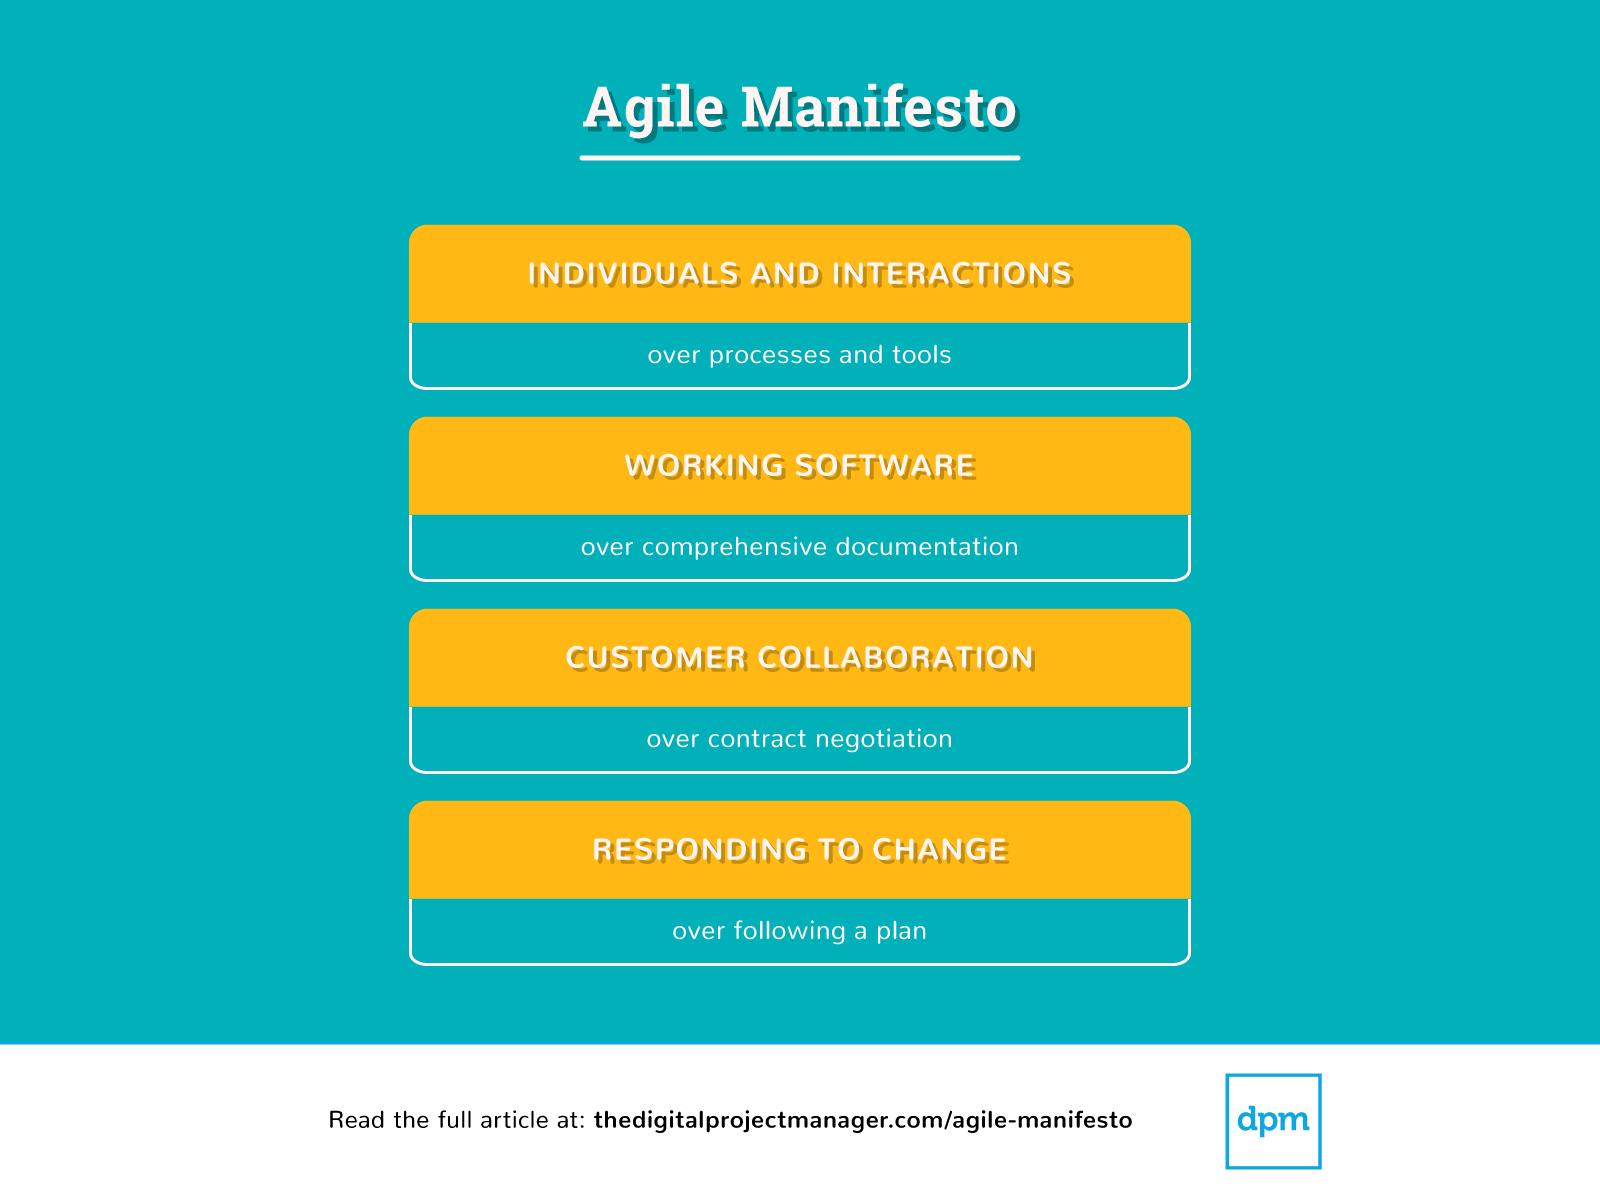 agile manifesto 4 values image